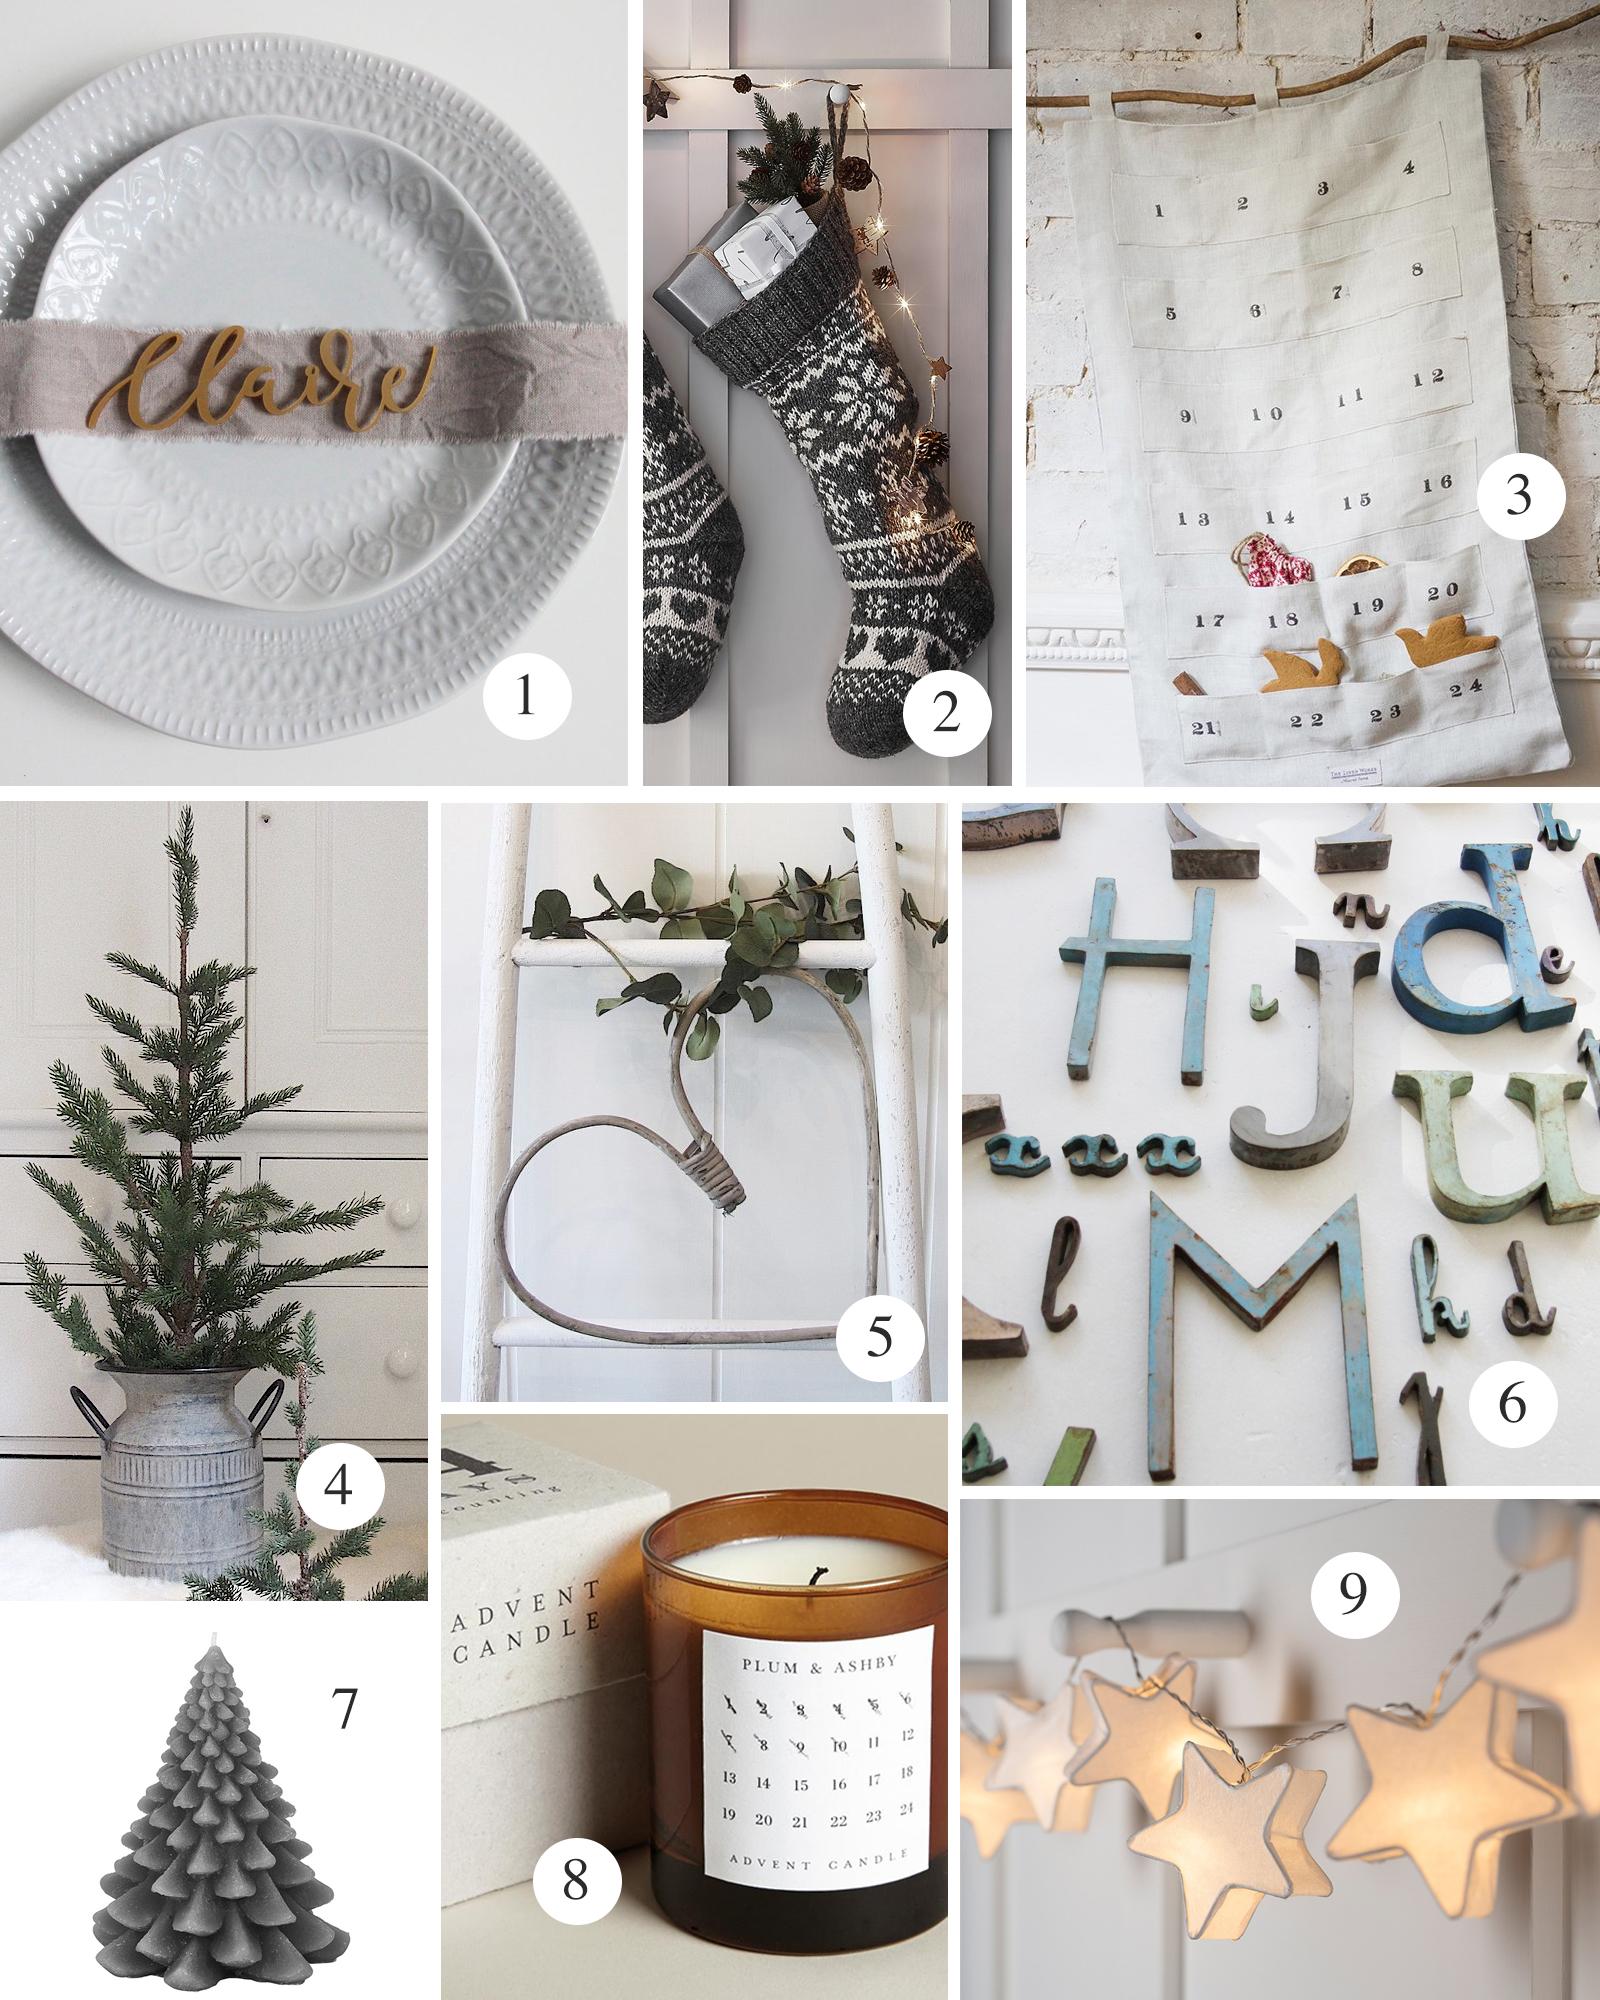 Fabulous Places christmas list 2 table and decor